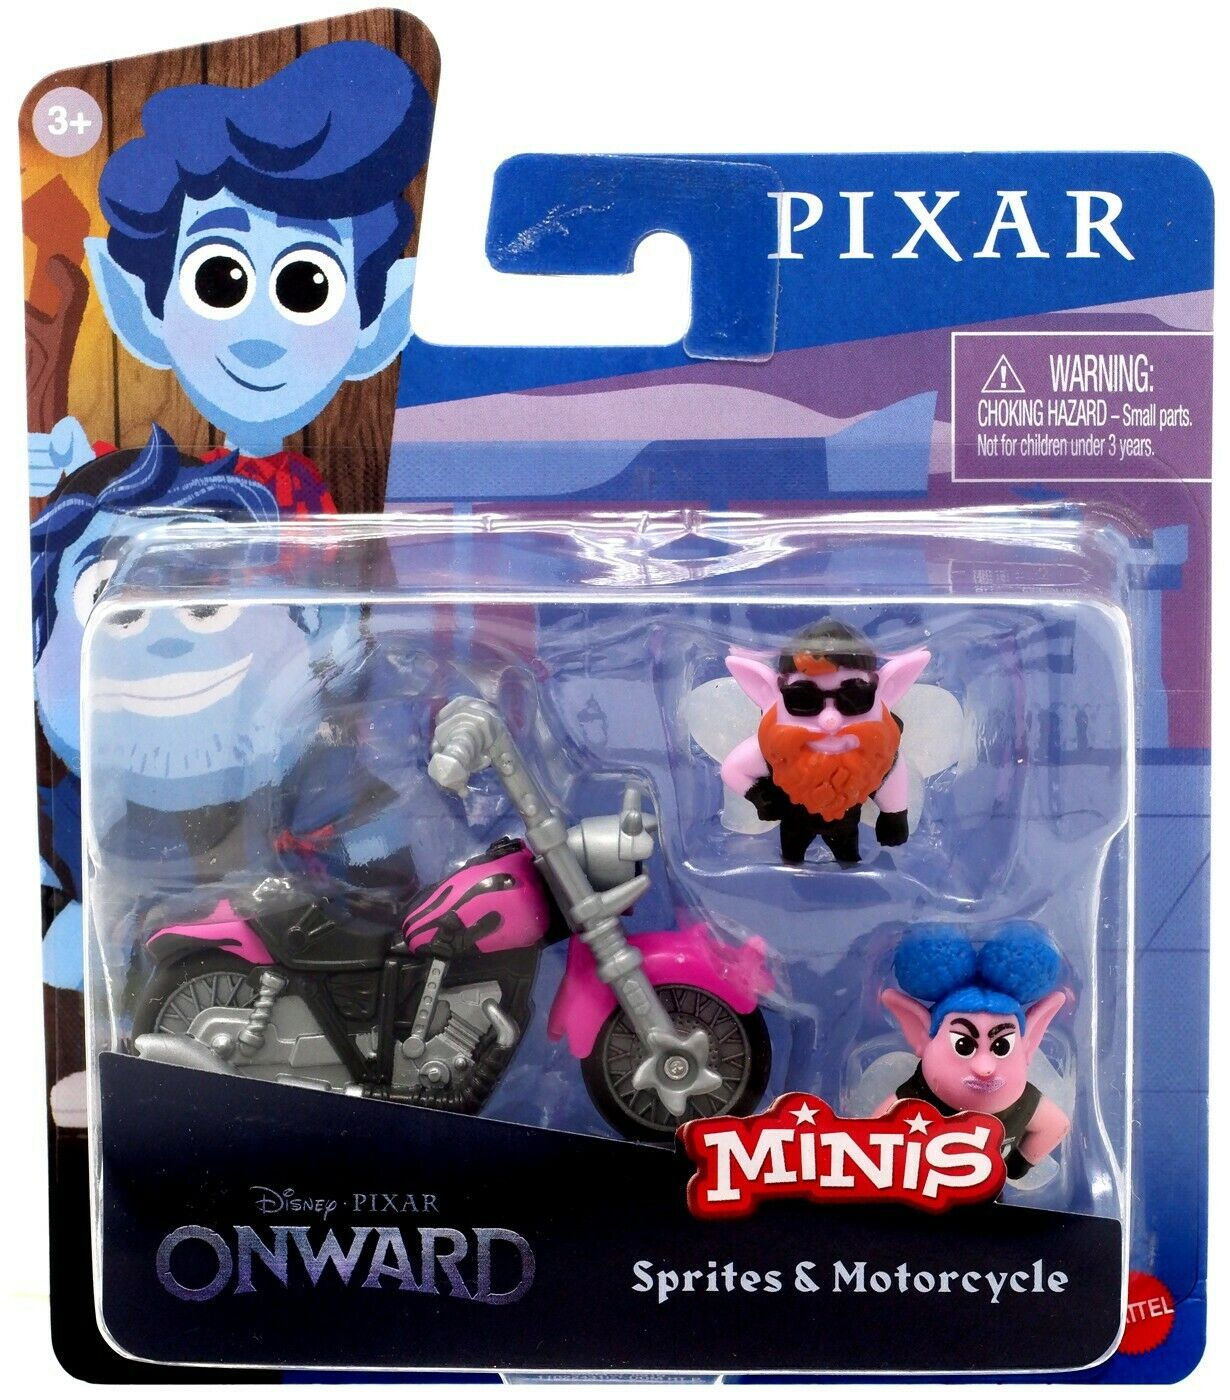 Disney Pixar - Minis Vinyl Figures : Elfes et Moto